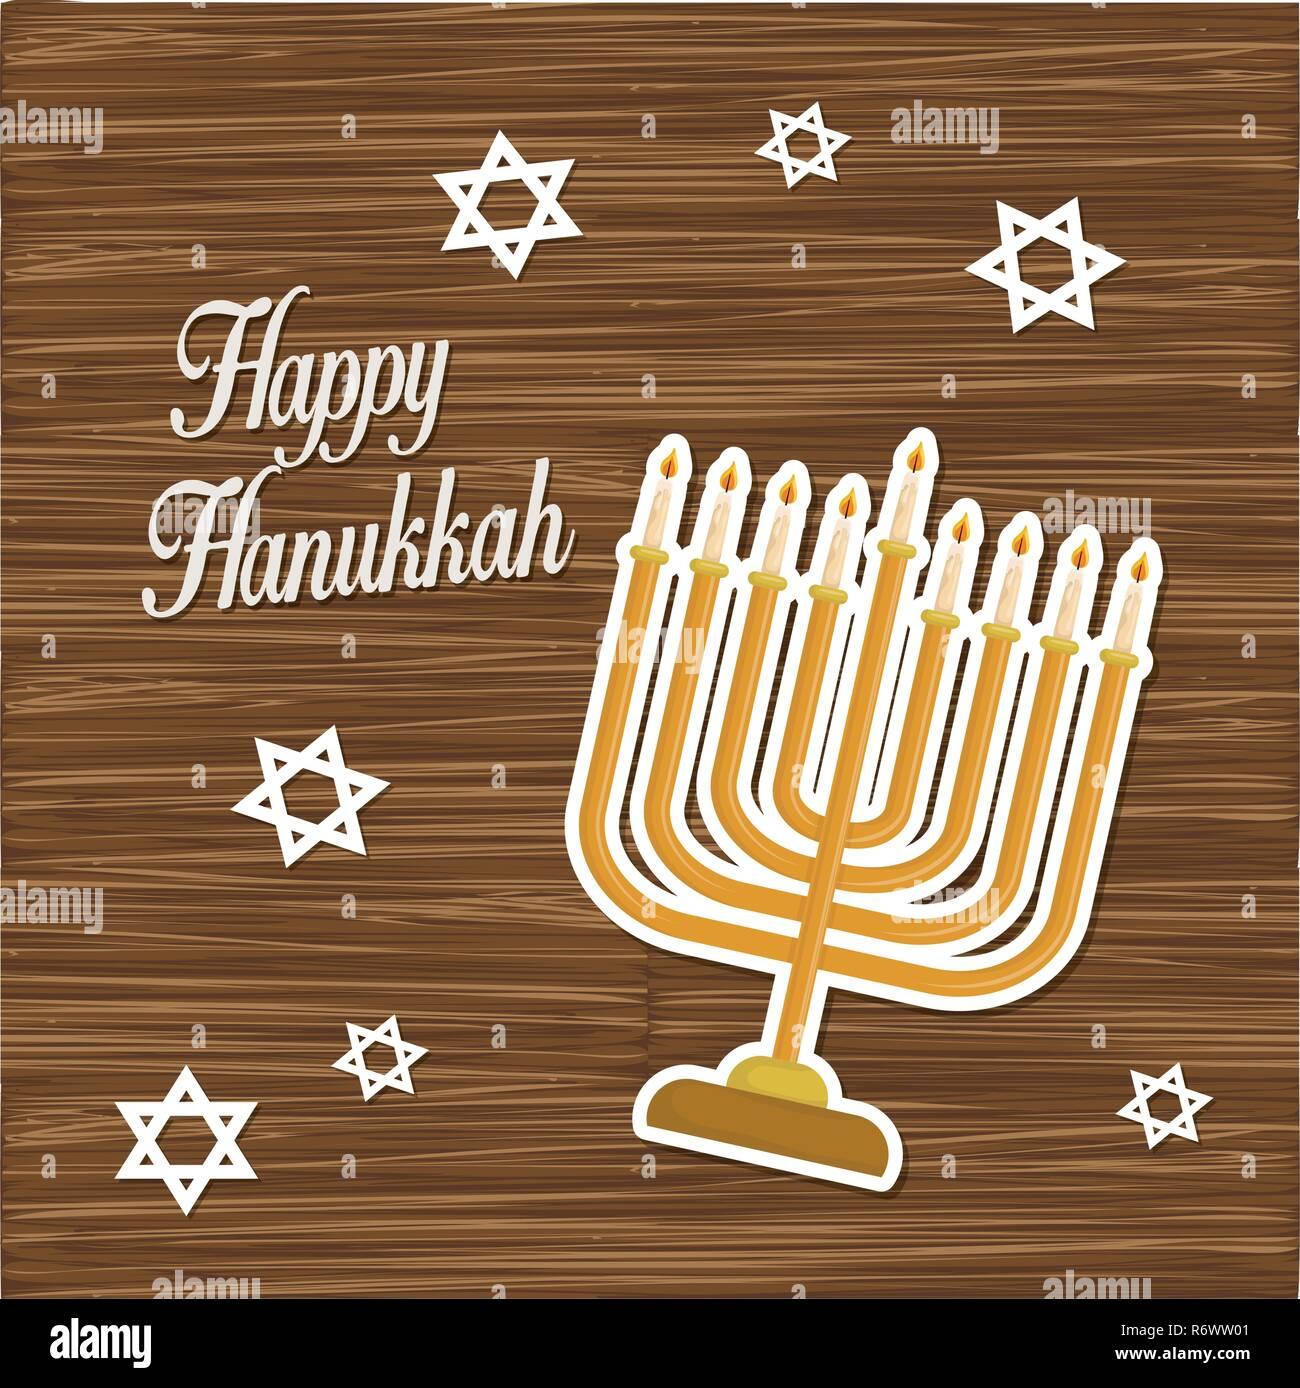 happy hanukkah card with chandelier vector illustration design - Stock Image